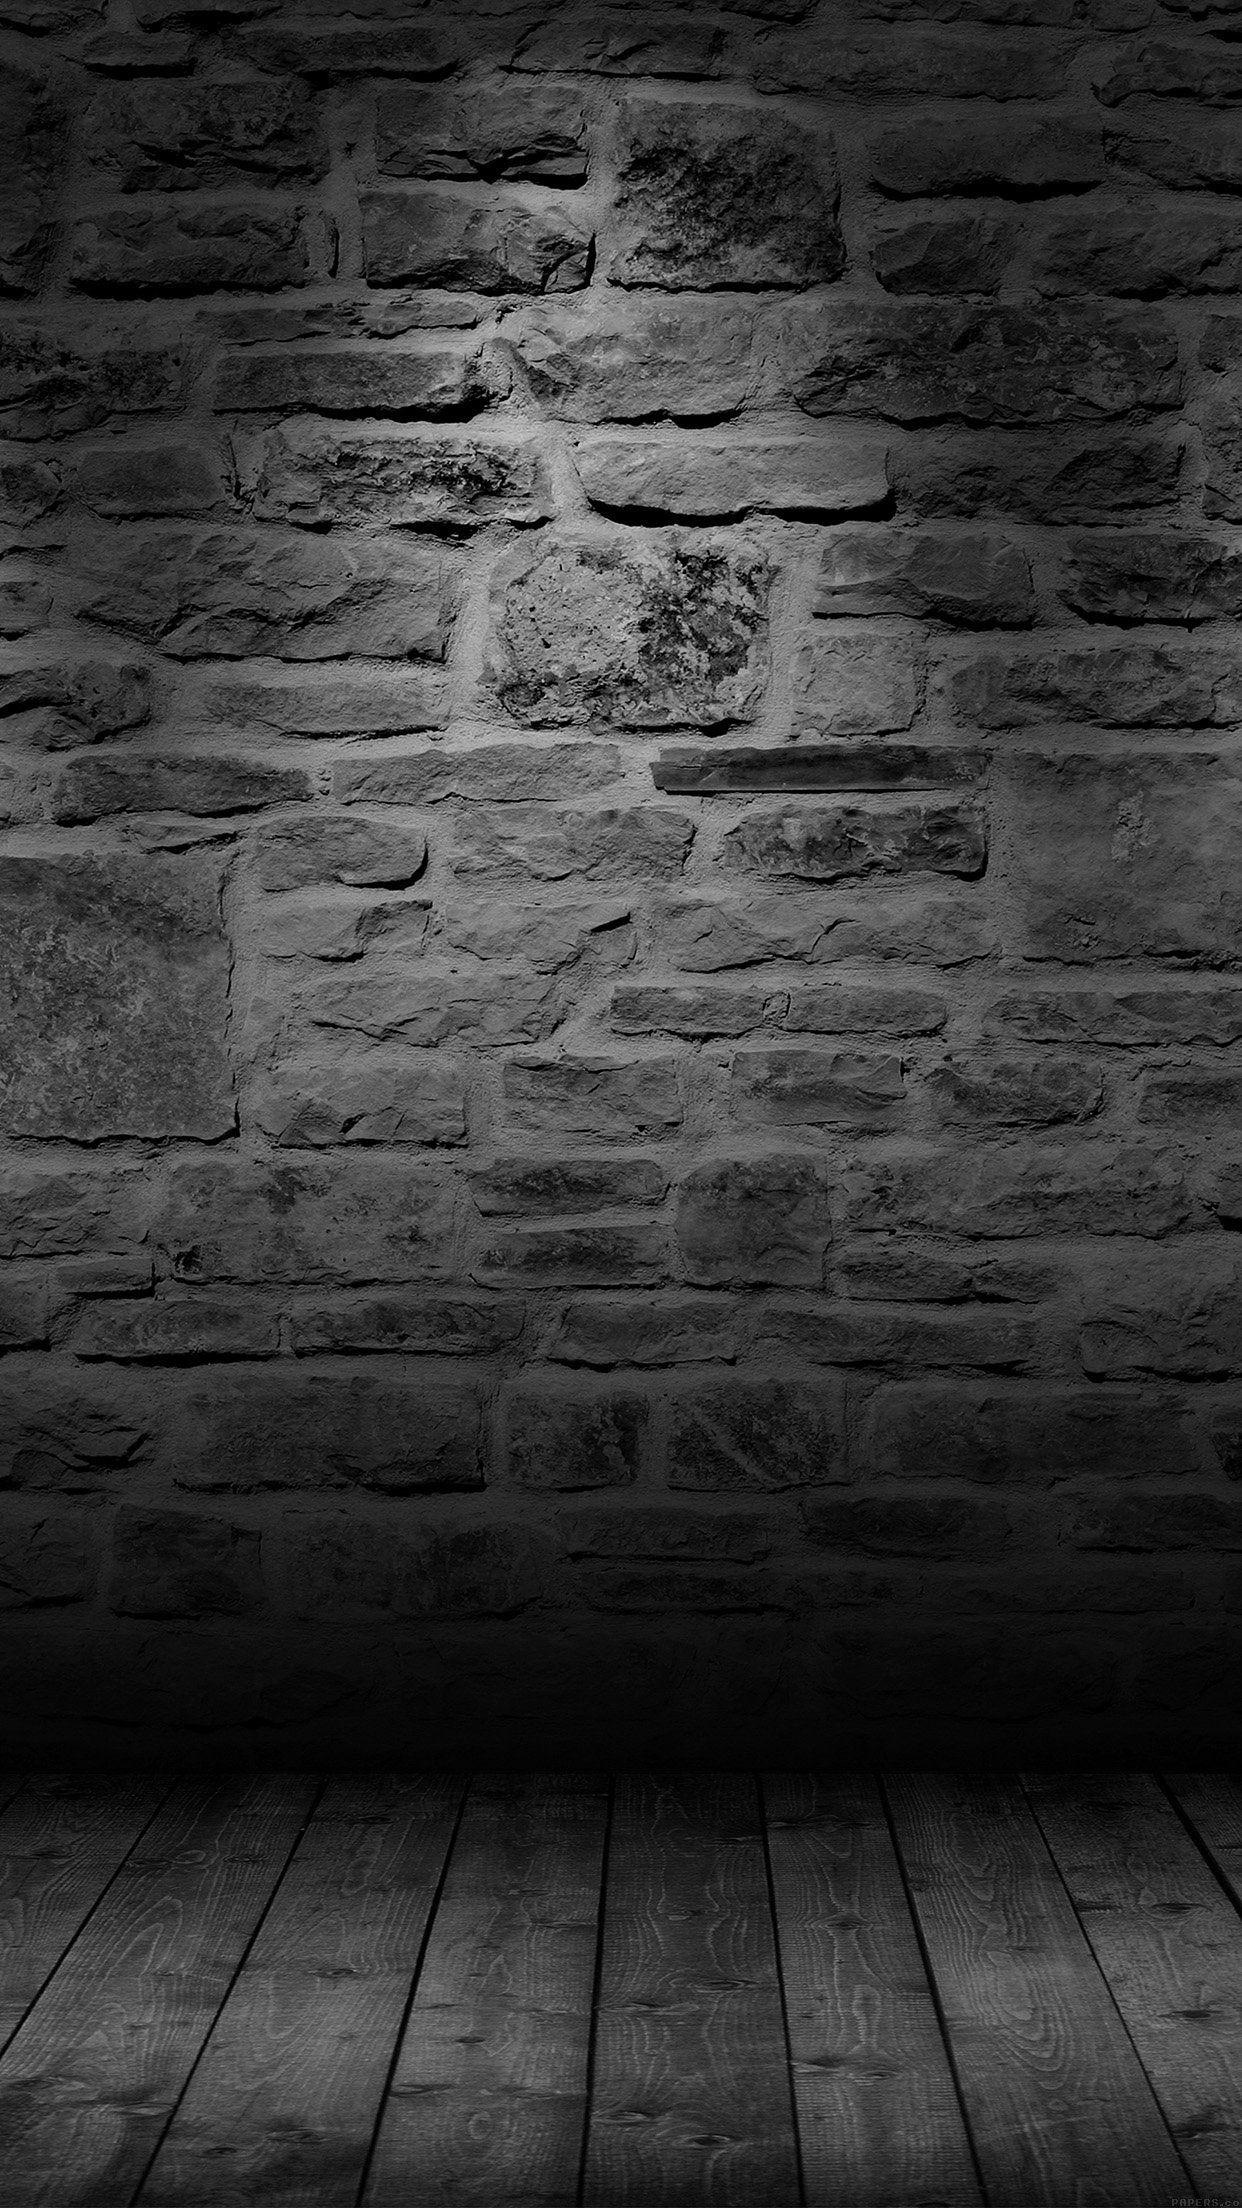 Wall Dark Bw Texture Pattern iPhone 6 Wallpaper Download